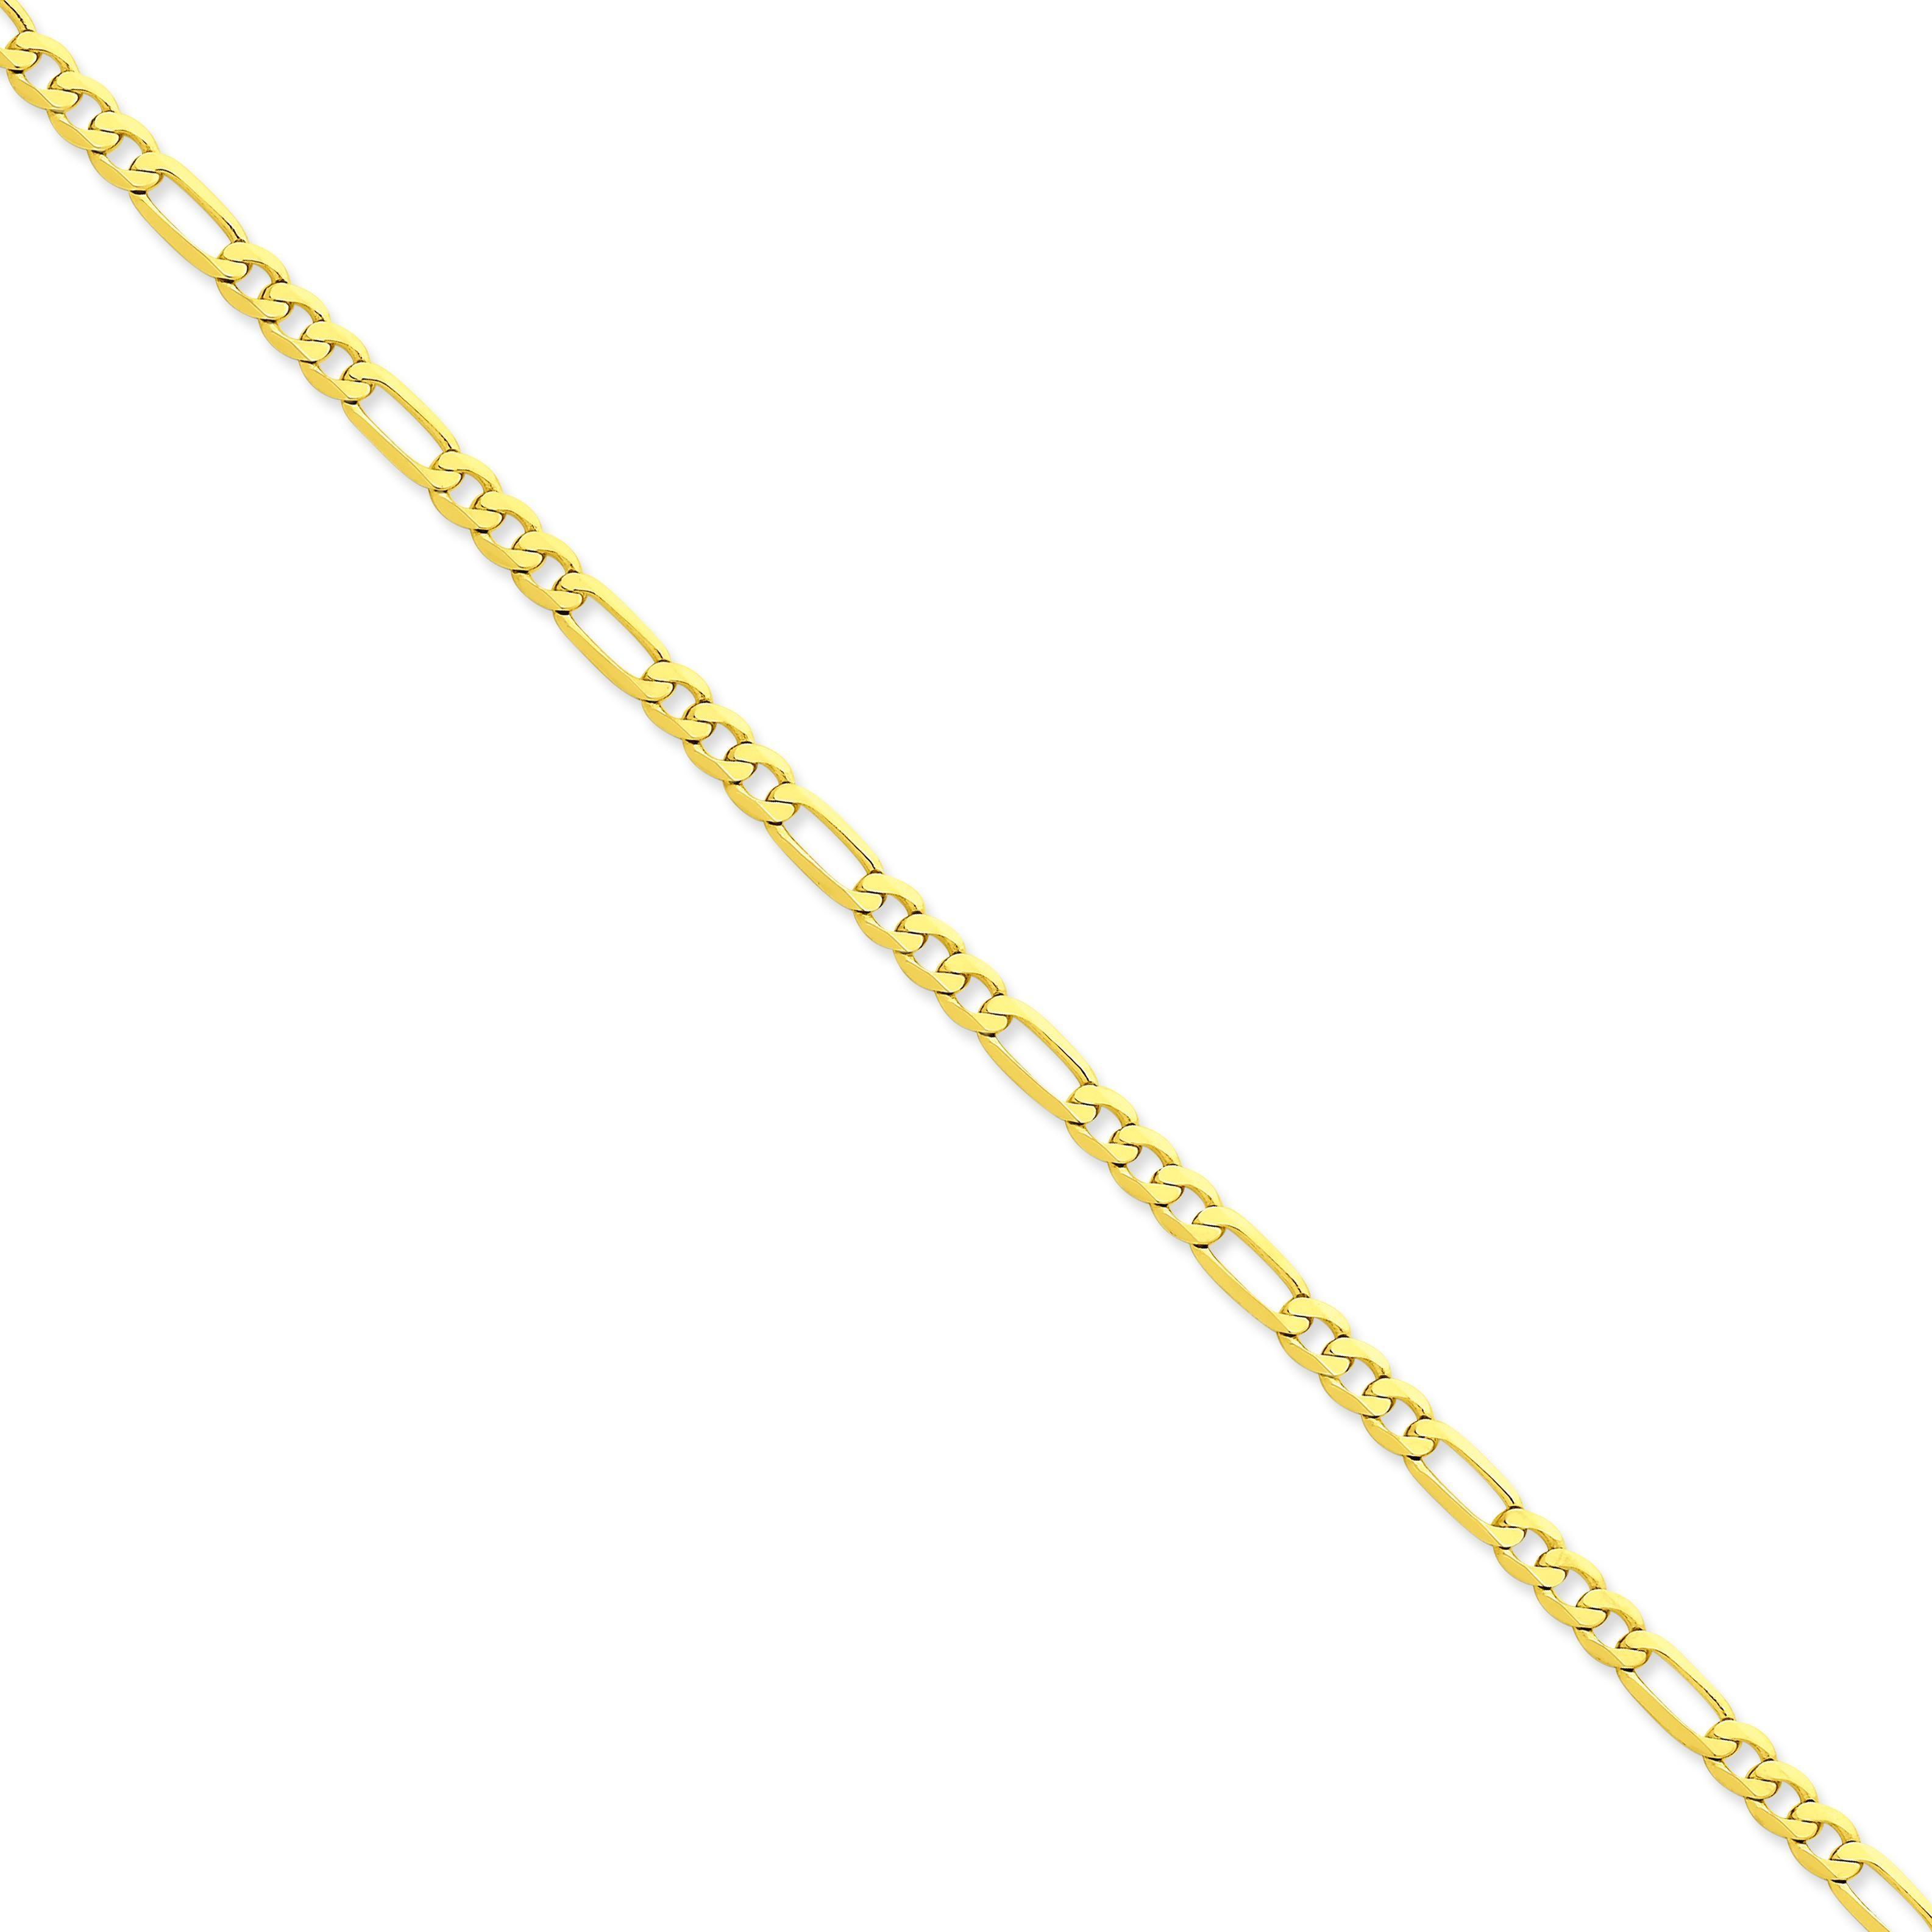 14k Yellow Gold 7 inch 4.75 mm Flat Figaro Chain Bracelet